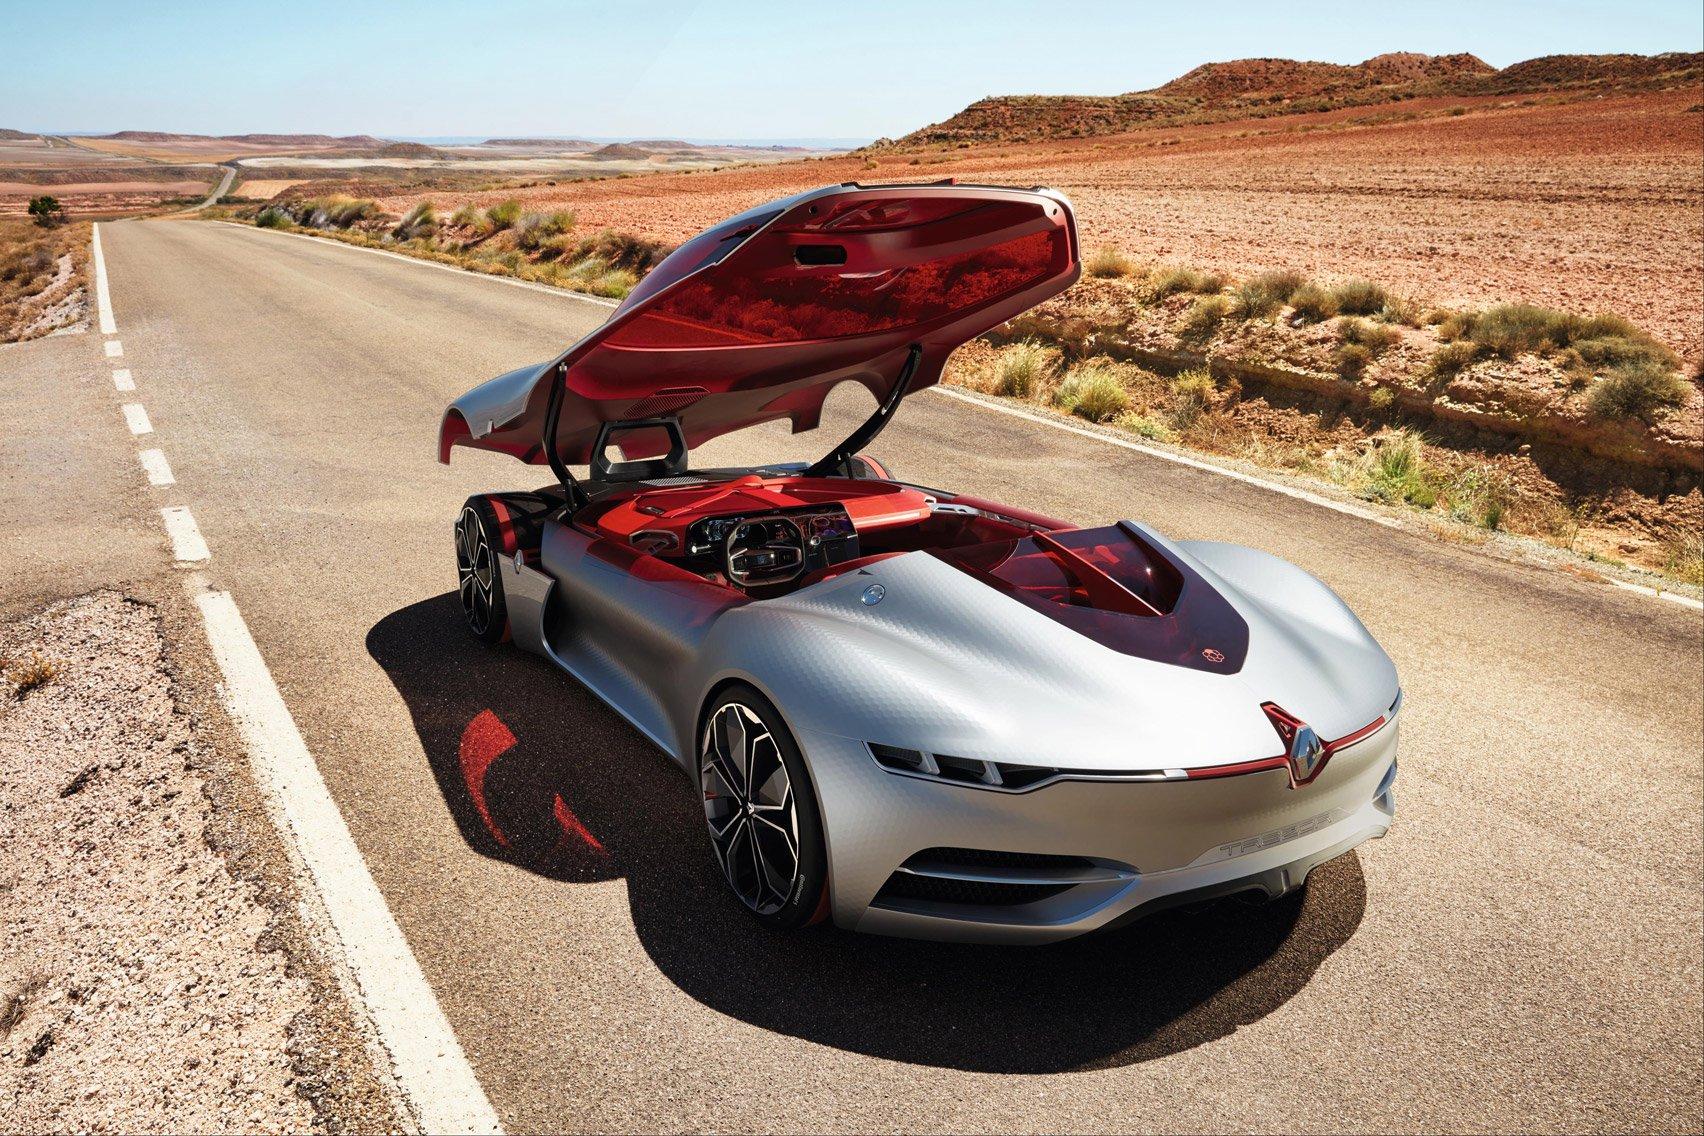 renault-trezor-concept-car-paris-motor-show_dezeen_1704_col_7